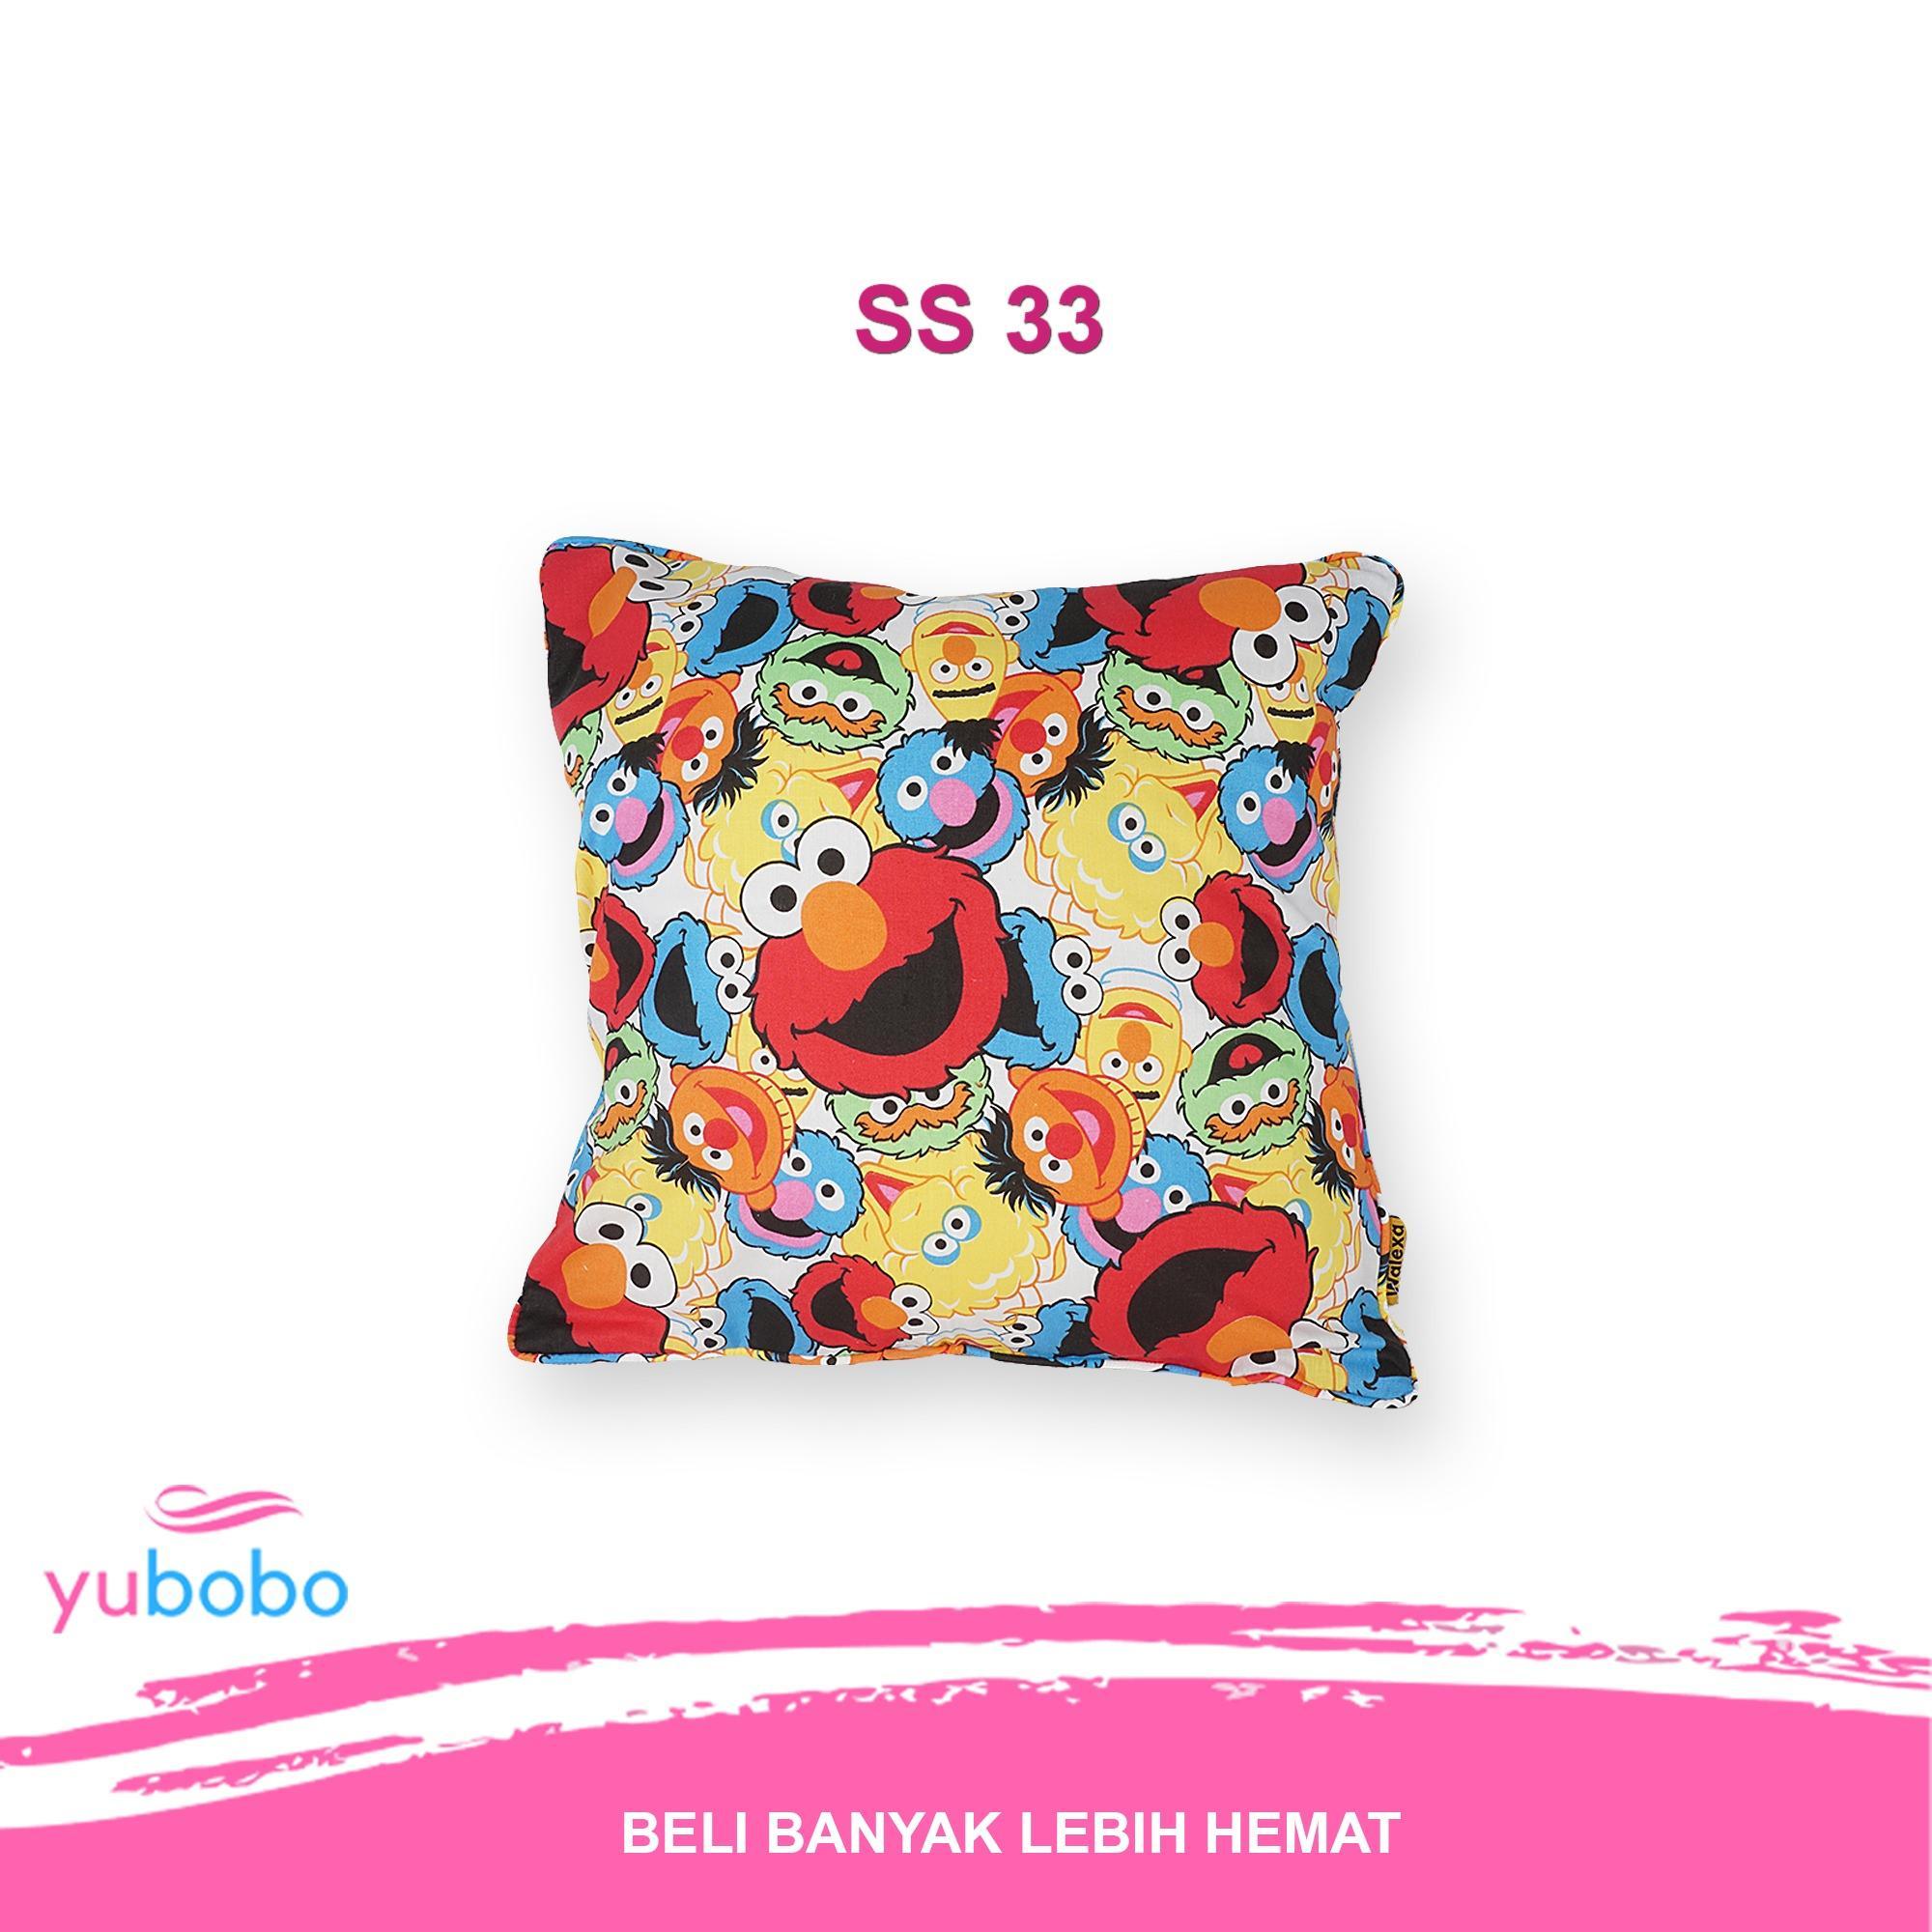 Yubobo - Sarung Bantal Sofa / Kursi / Sopa / Tamu Premium 40 x 40cm (Hanya Sarung) SS890155